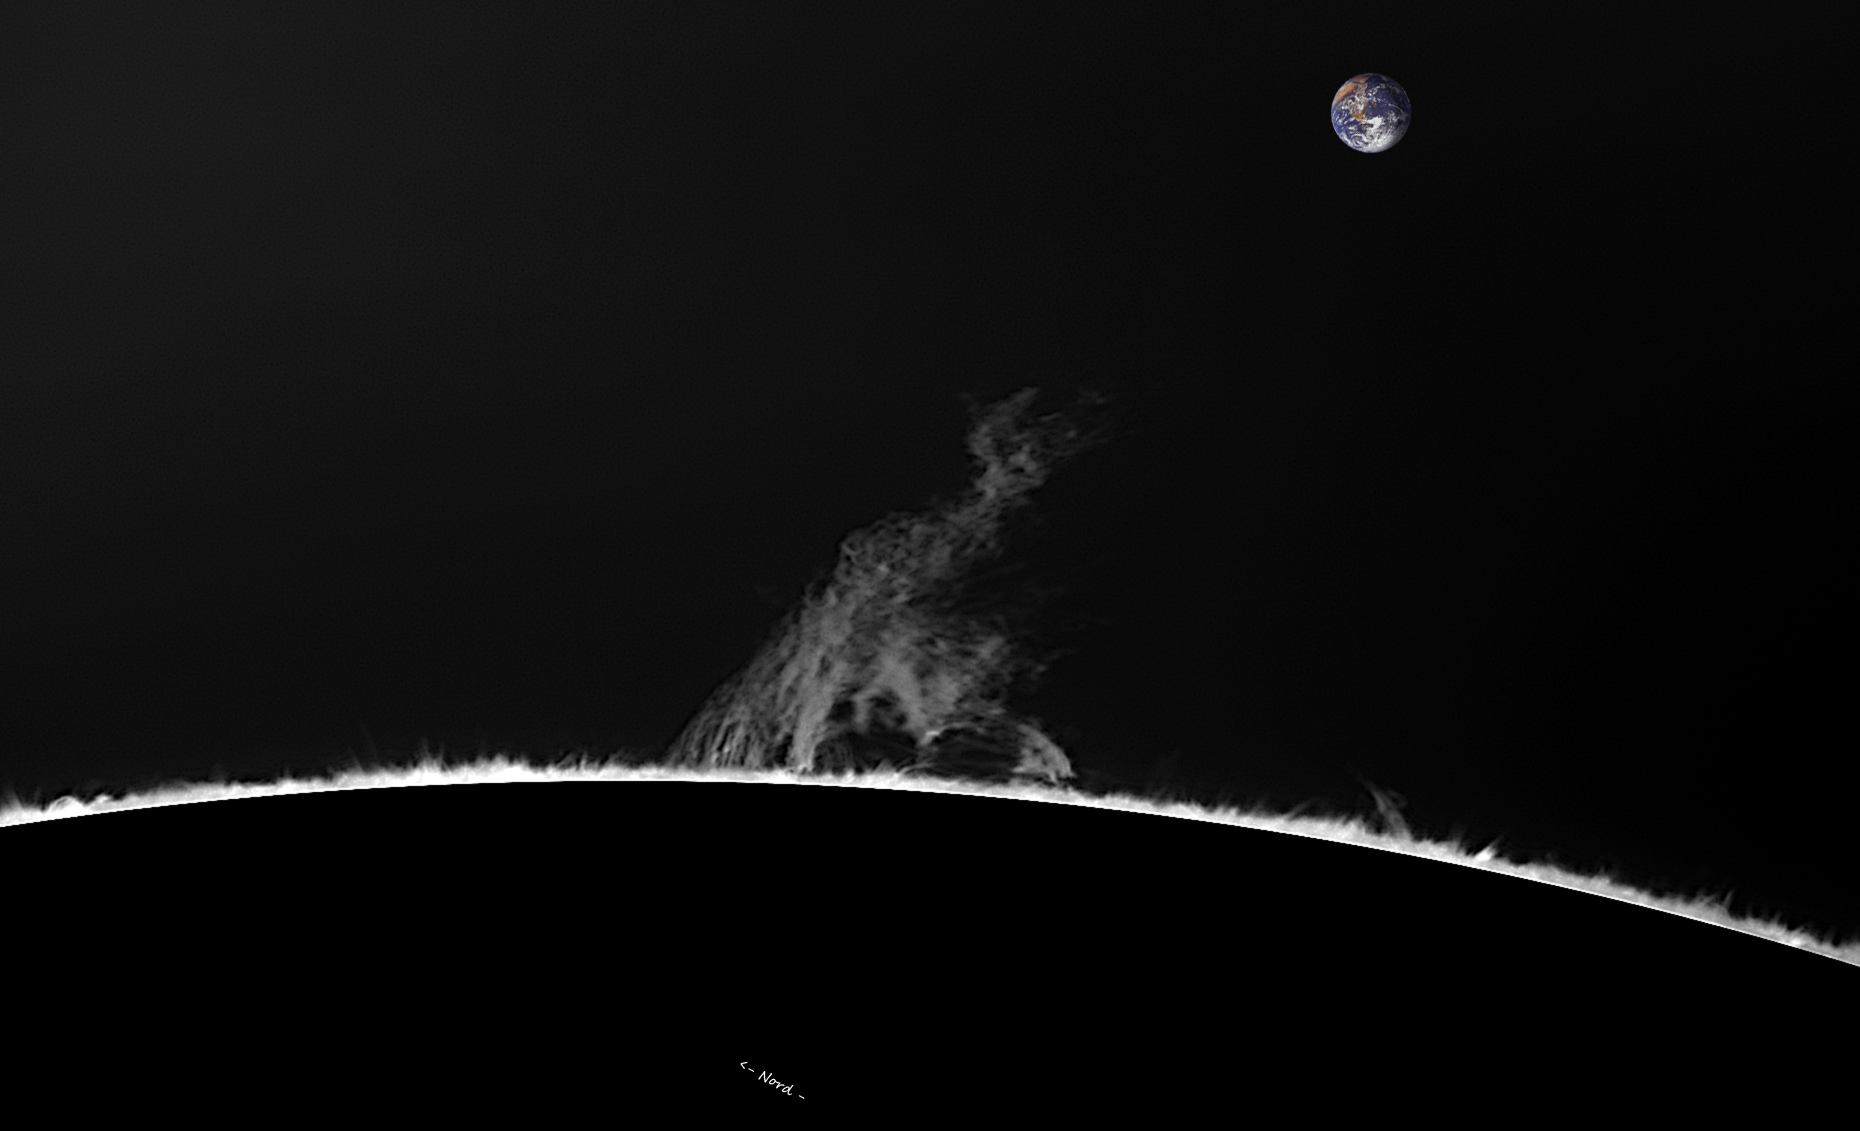 Limbe NW - 62°N - 14 janvier 2018